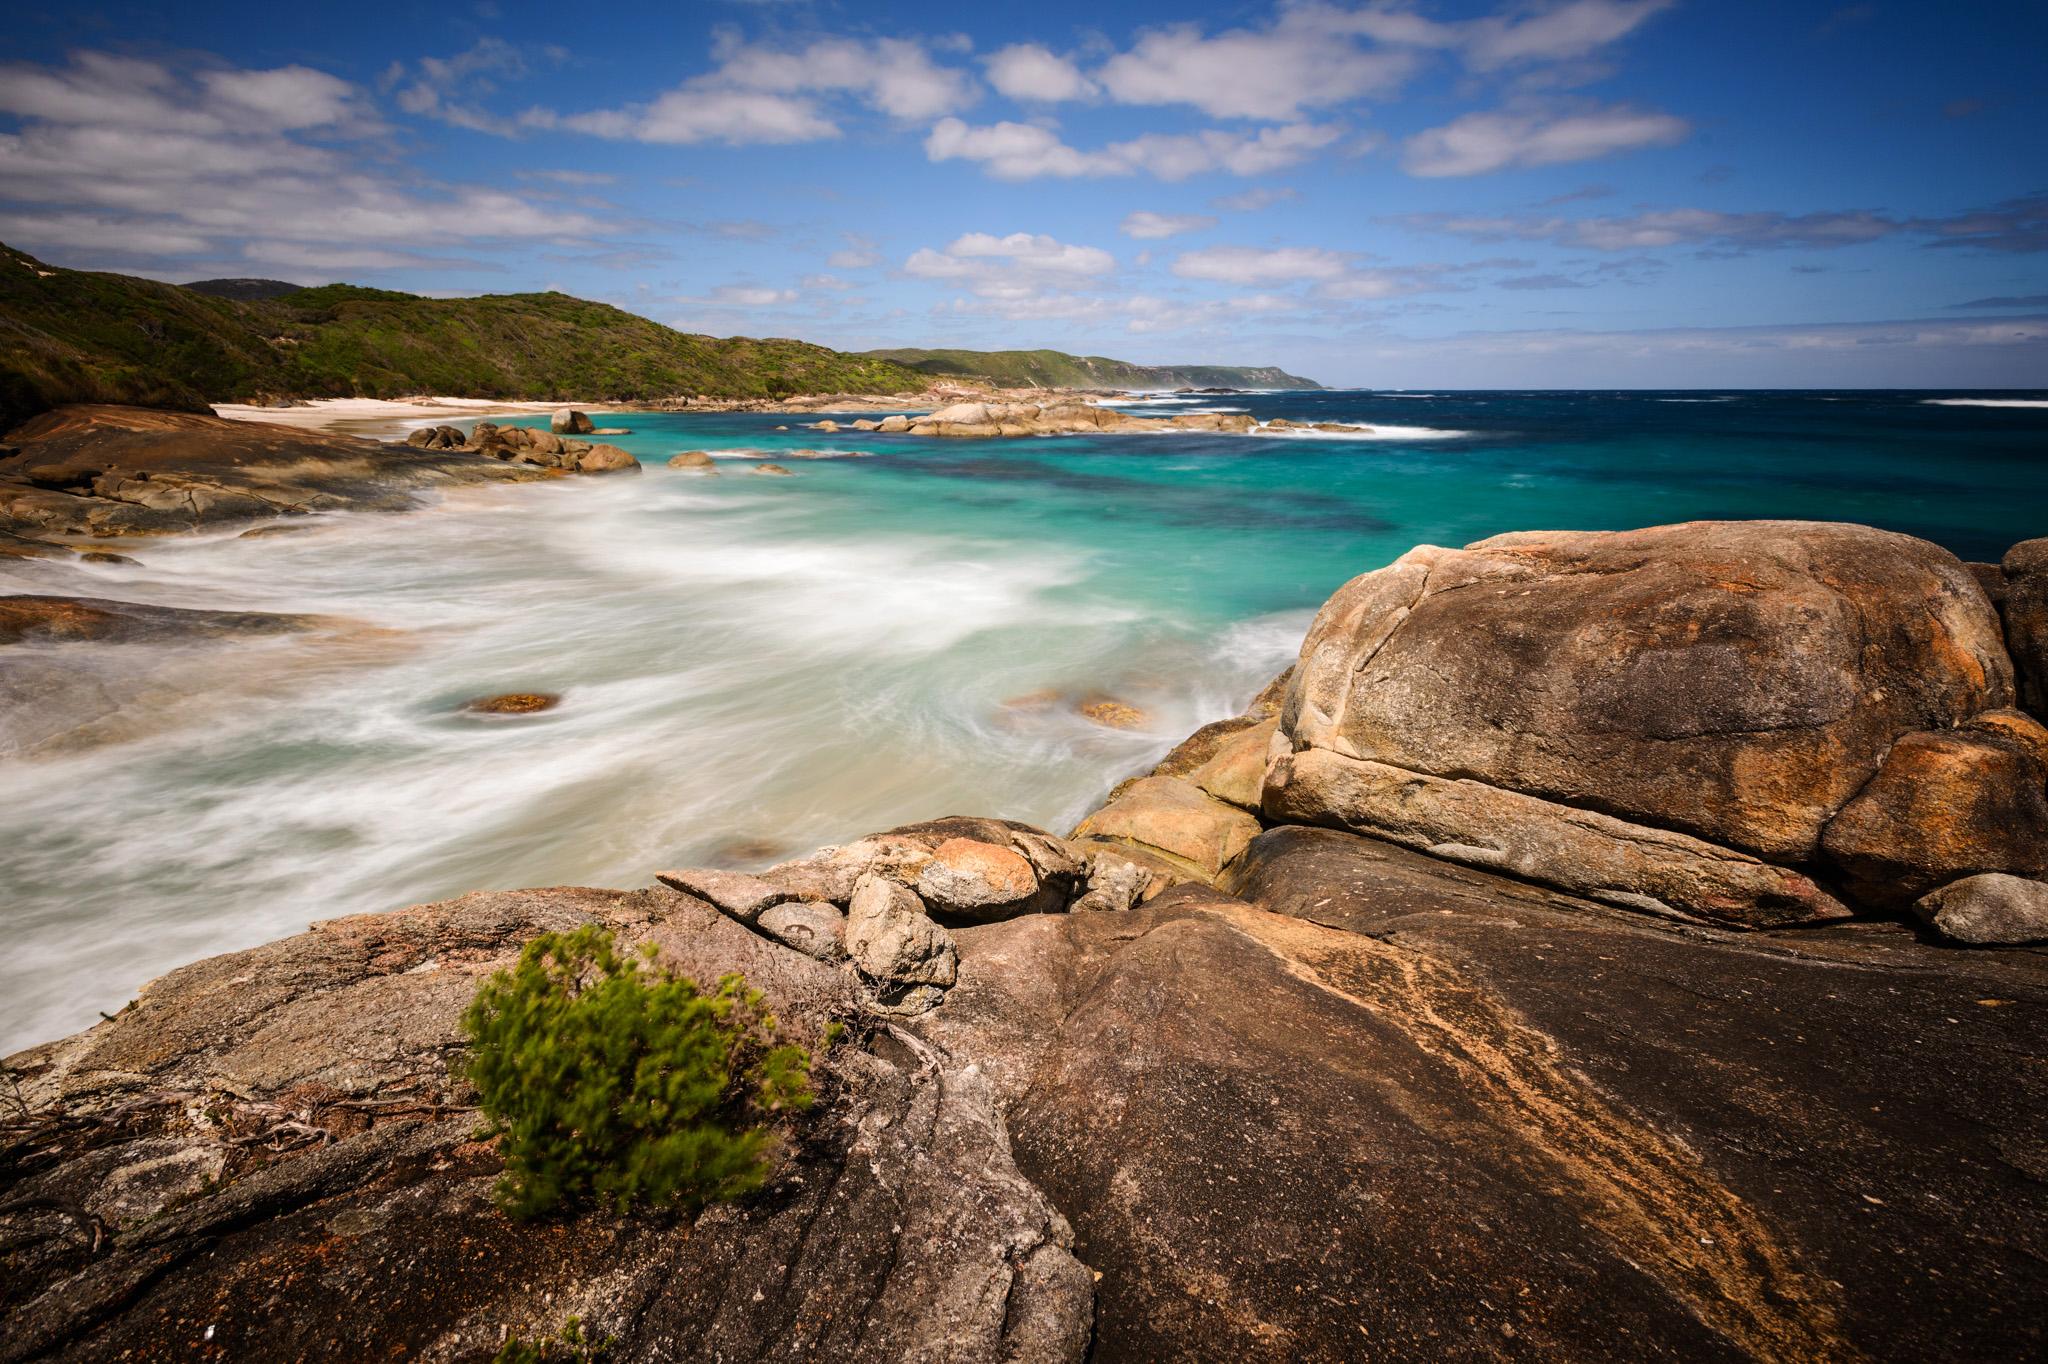 William Bay Coastline